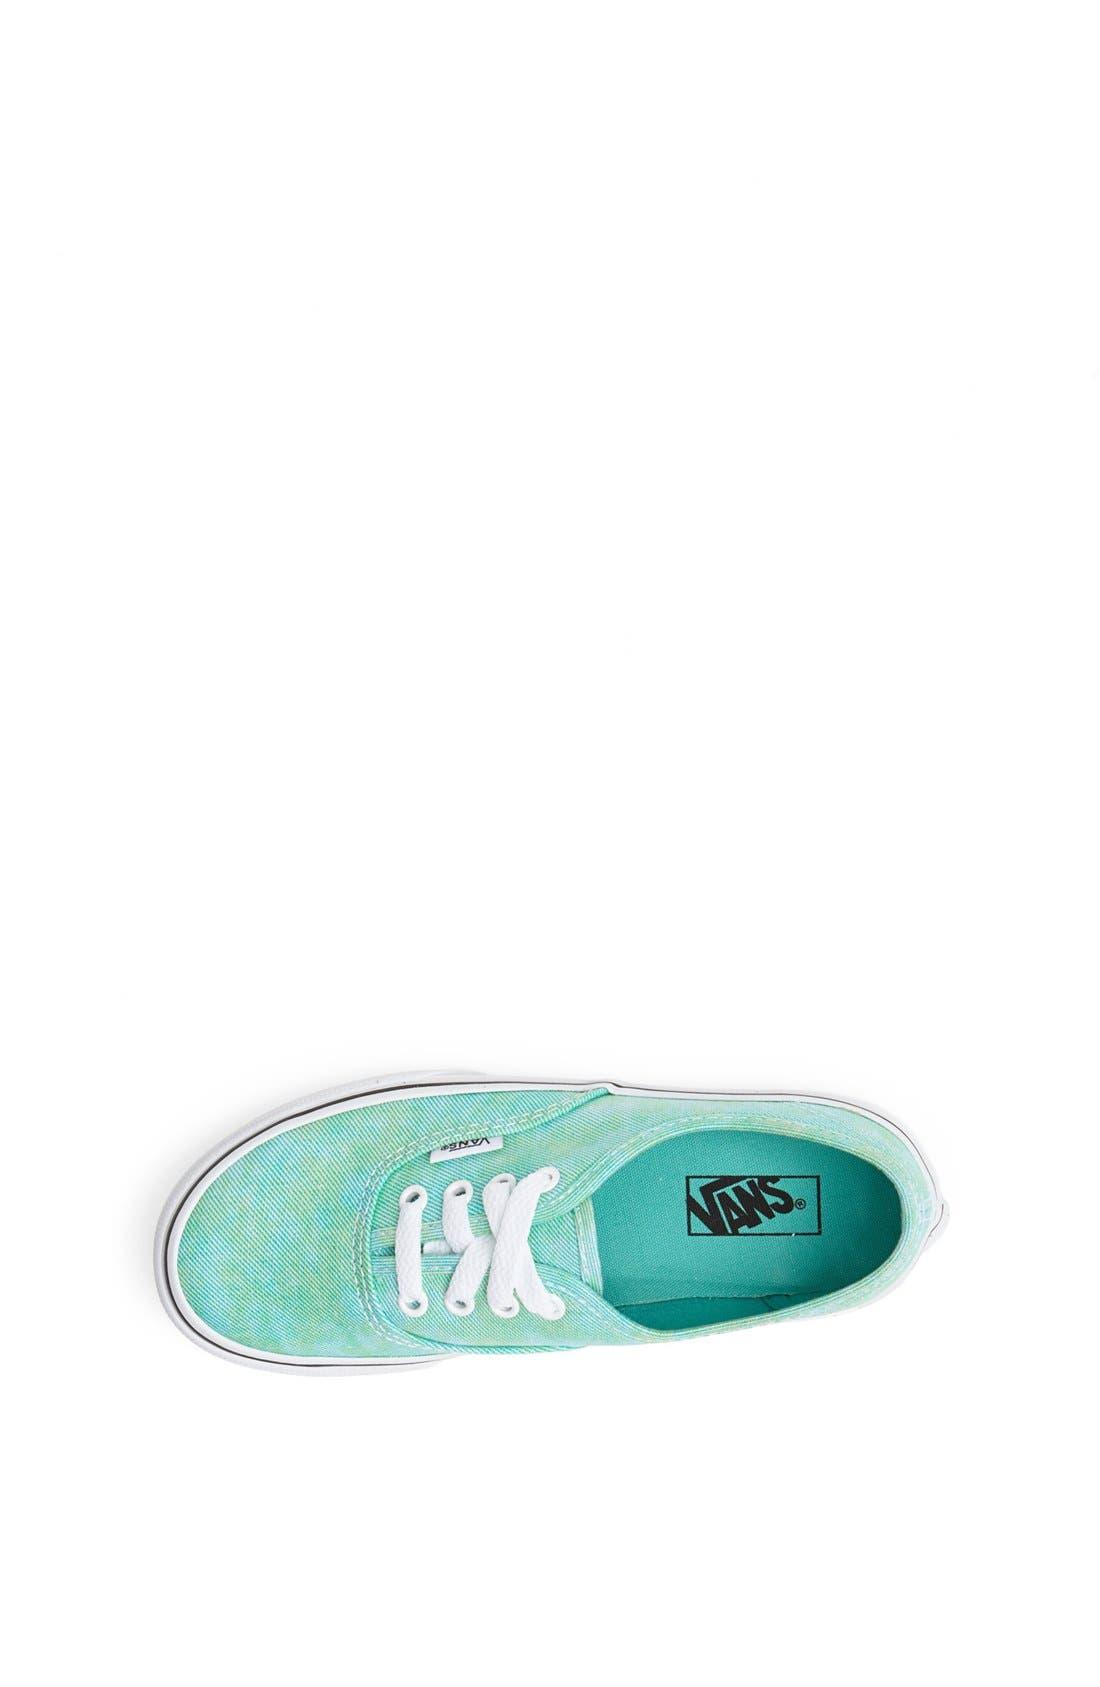 Alternate Image 3  - Vans 'Authentic' Glitter Canvas Sneaker (Toddler, Little Kid & Big Kid)